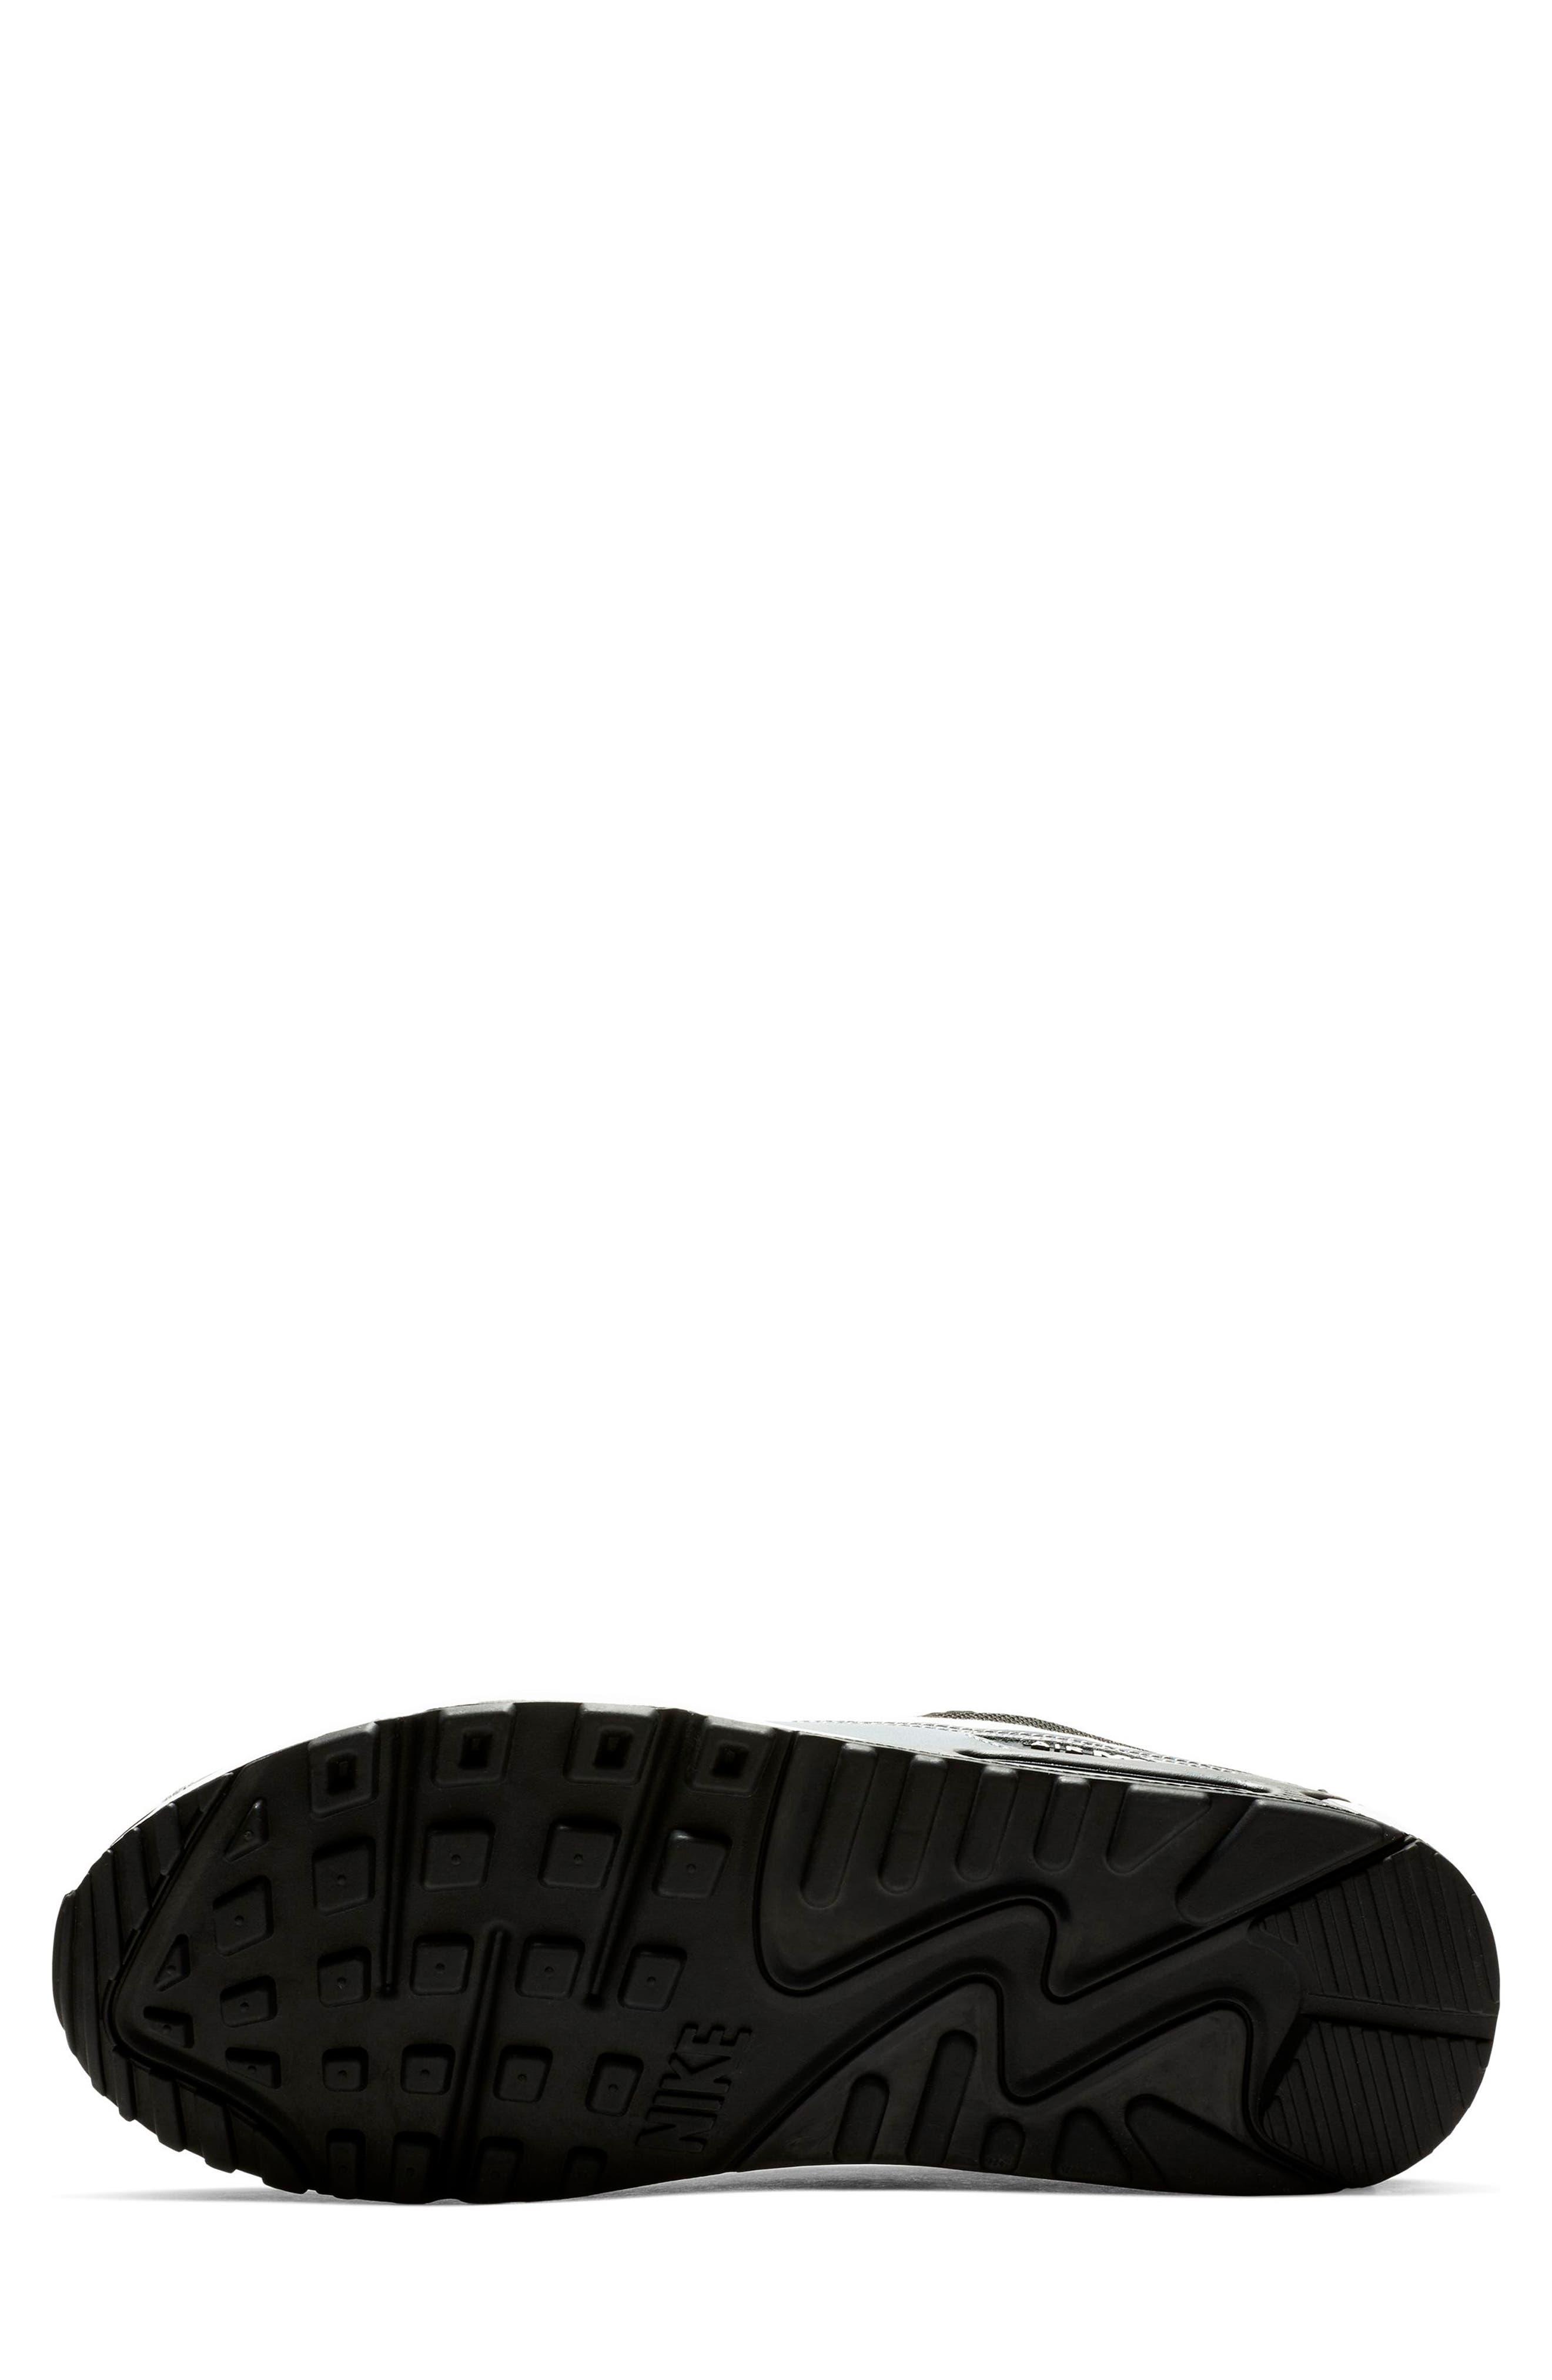 NIKE, Air Max 90 Essential Sneaker, Alternate thumbnail 4, color, BLACK/ WHITE/ COOL GREY